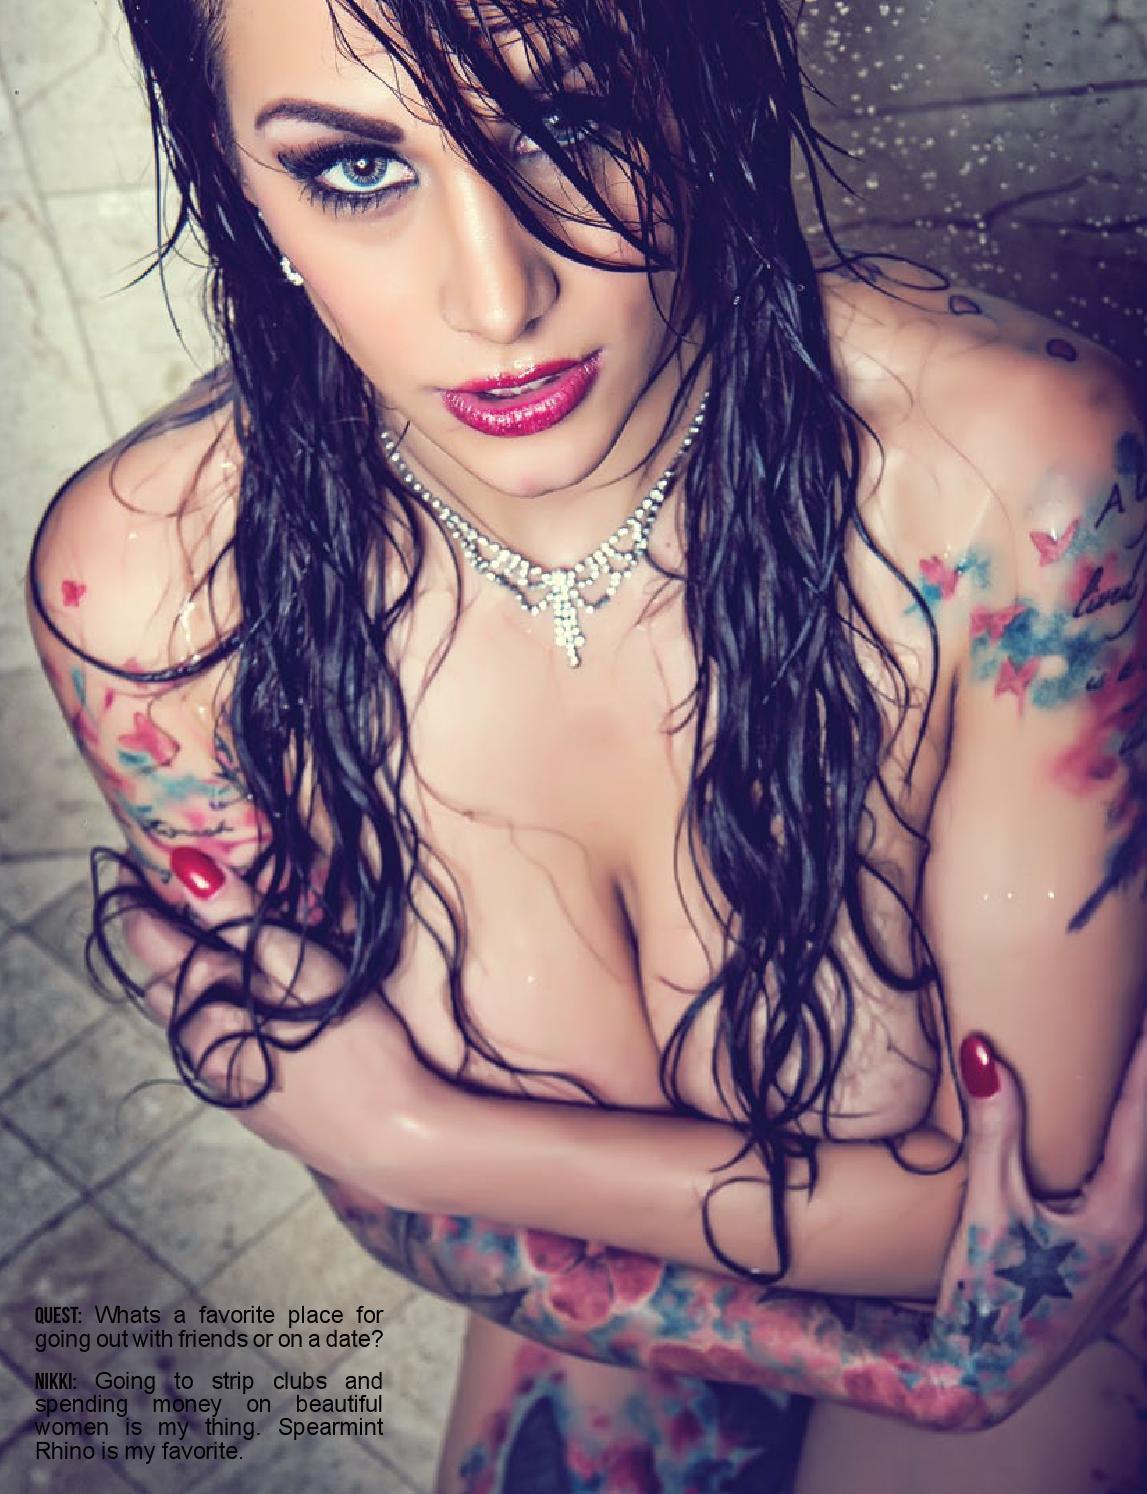 braless Sex Nikki Nichole naked photo 2017